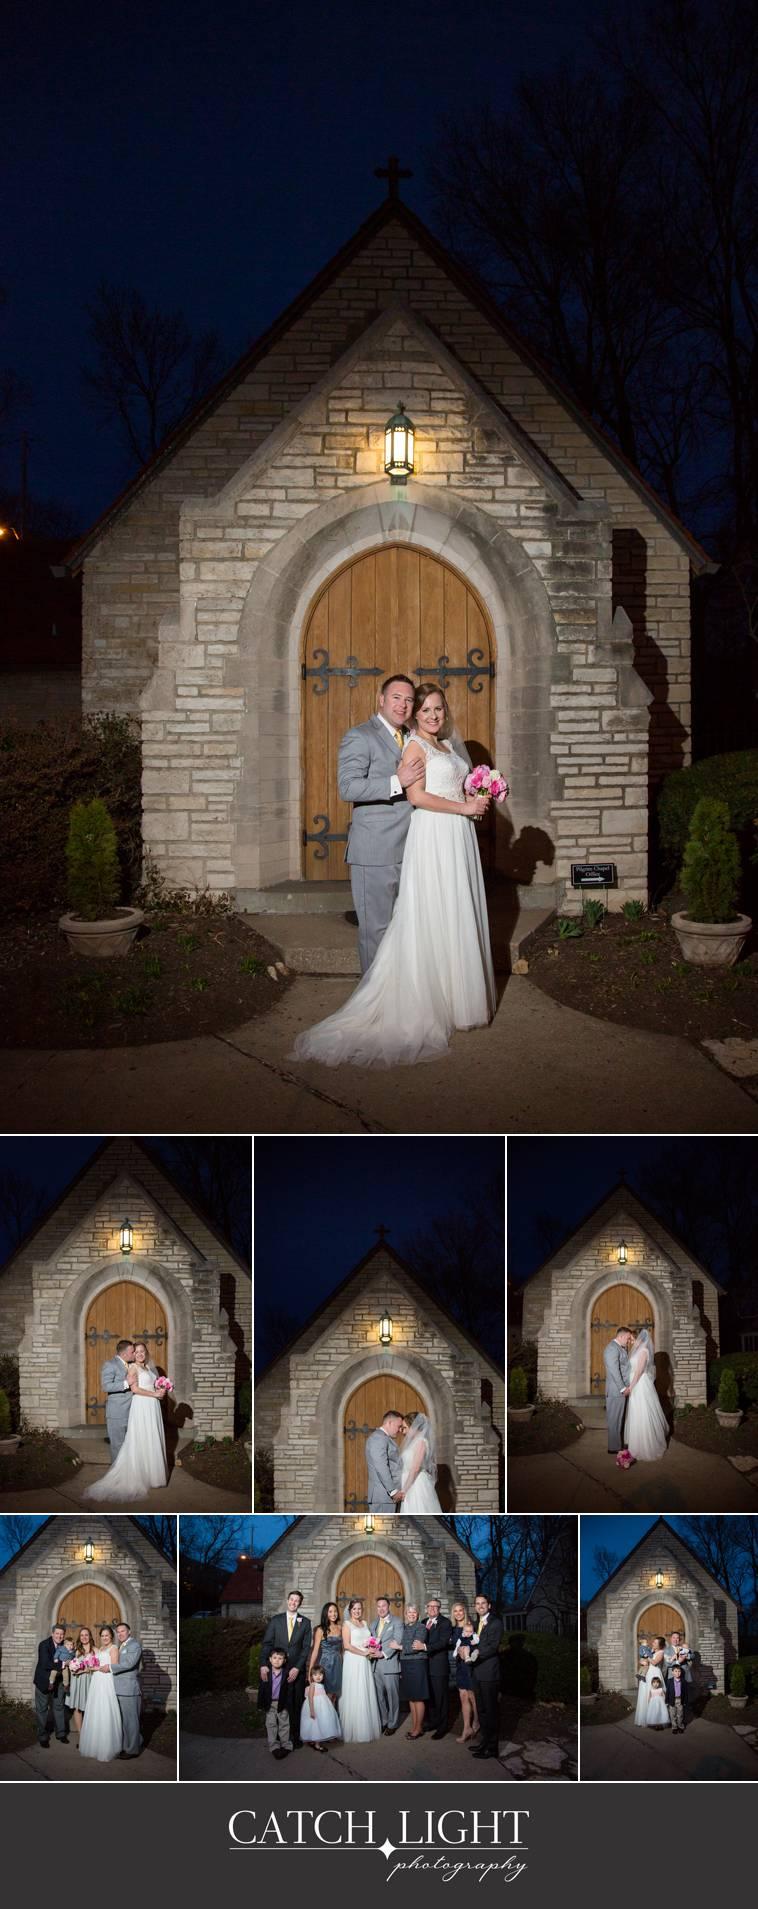 08_Kanas City Wedding Photography Pilgrim Chapel